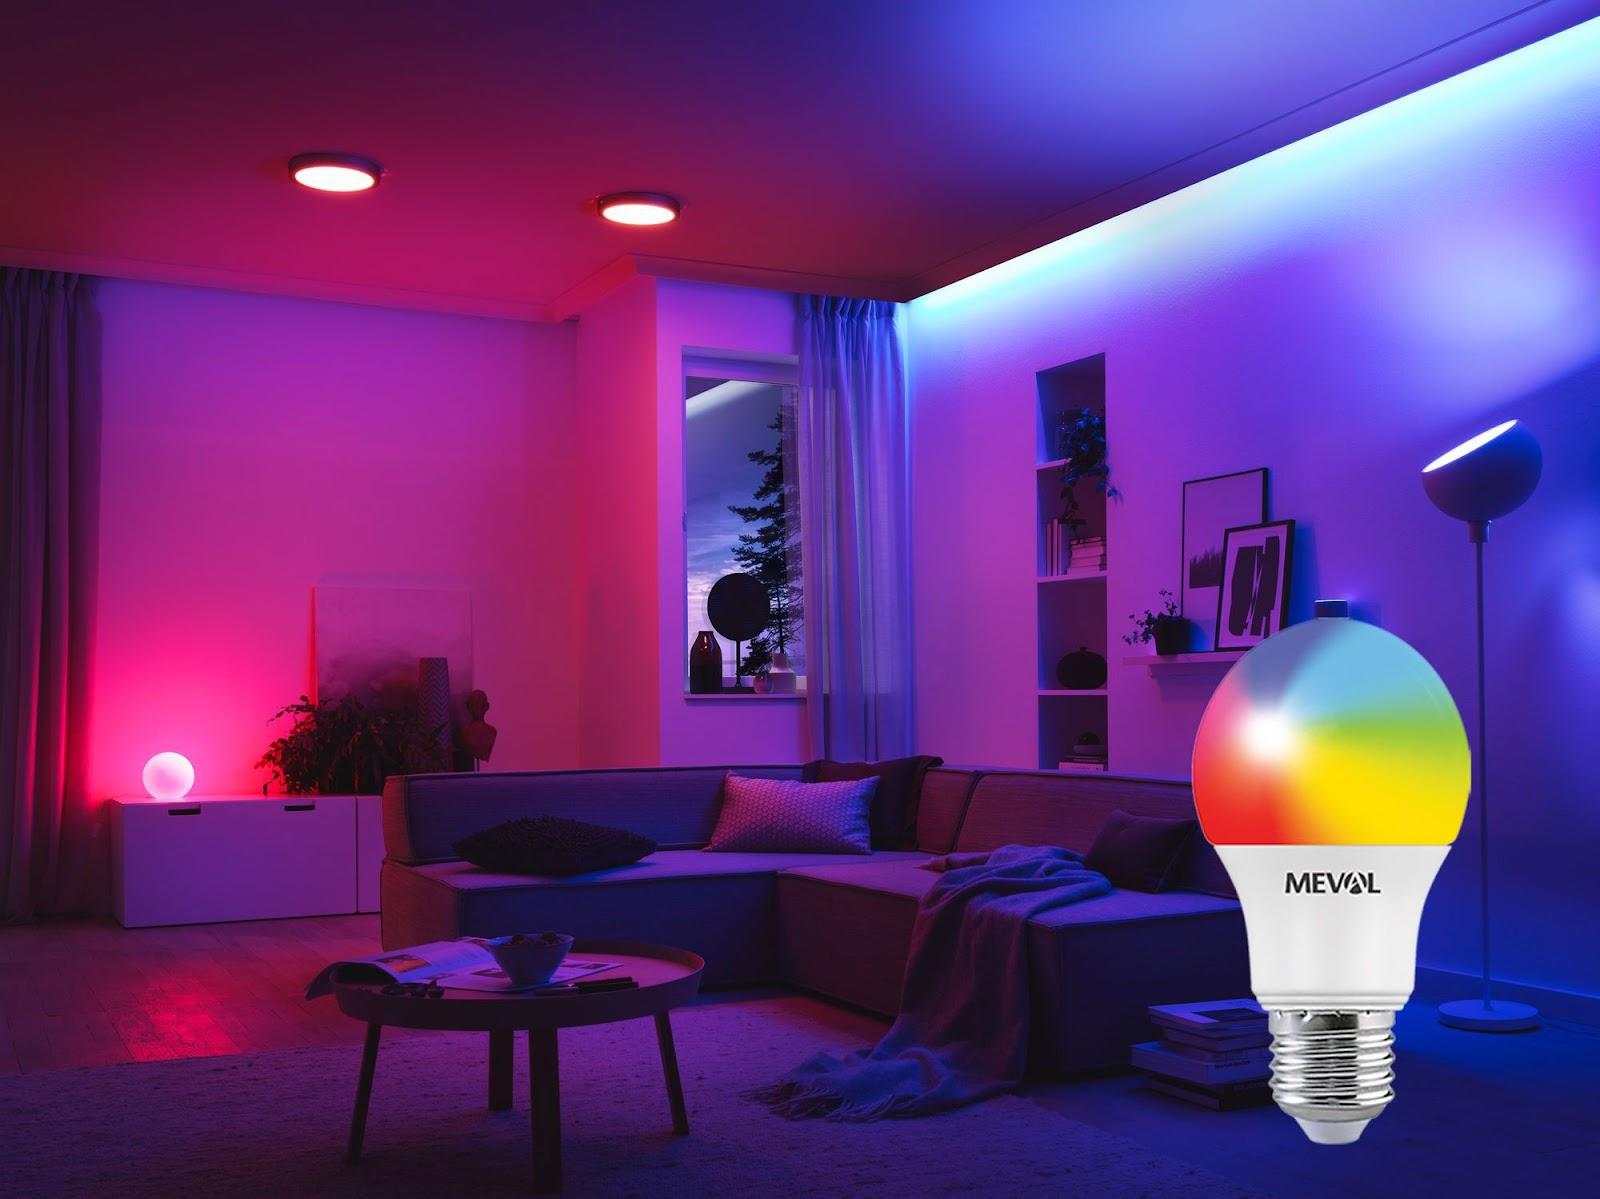 Lampu LED Meval Smart Bulb